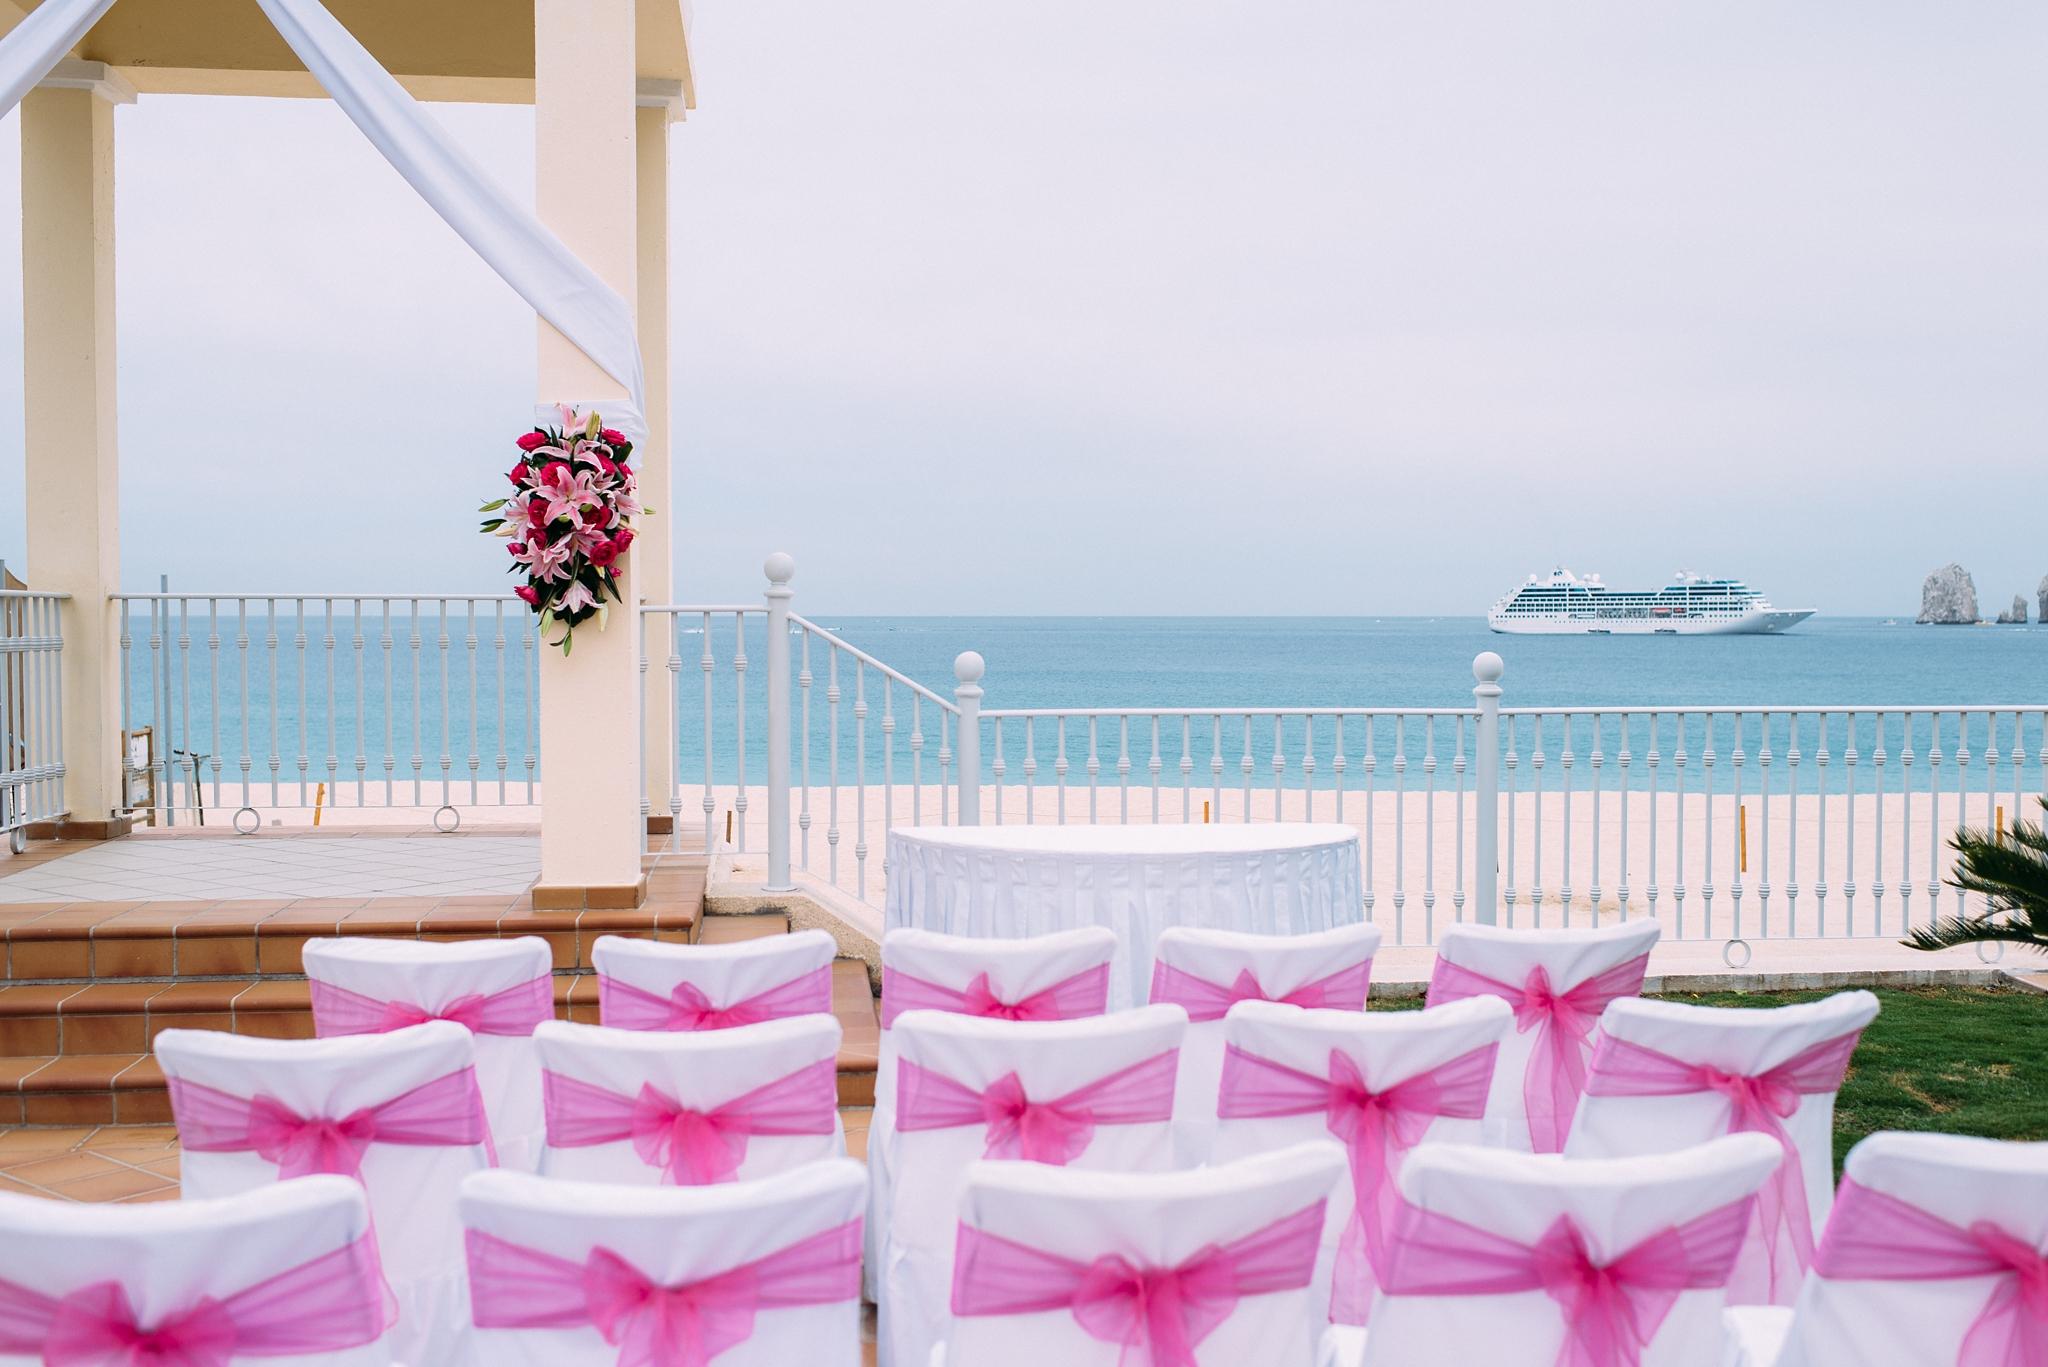 kaihla_tonai_intimate_wedding_elopement_photographer_1342